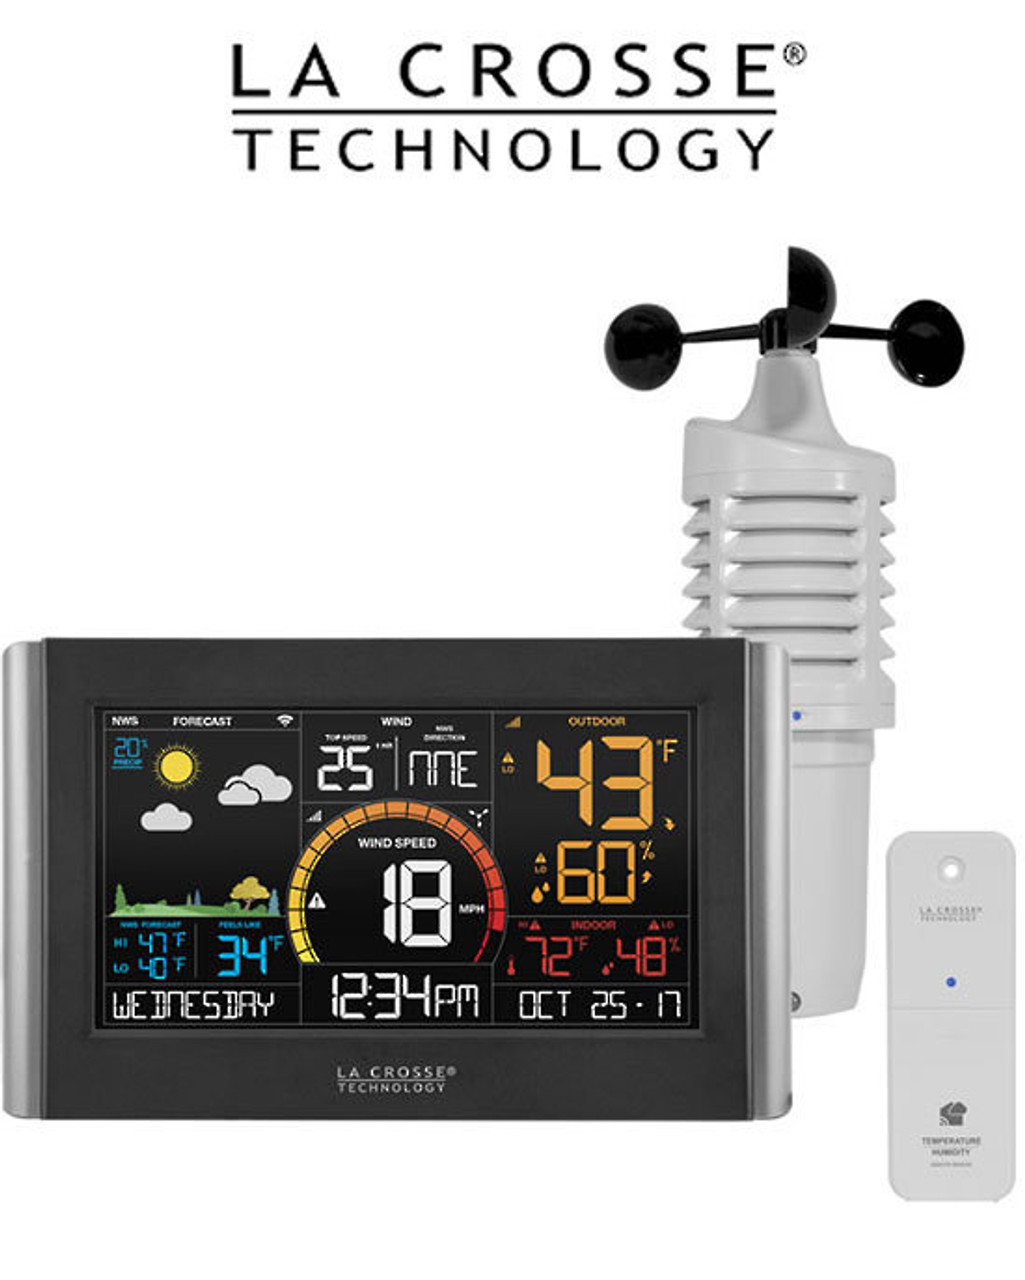 La Crosse V21-WTH Wireless WiFi Remote Monitoring Wind Speed Station